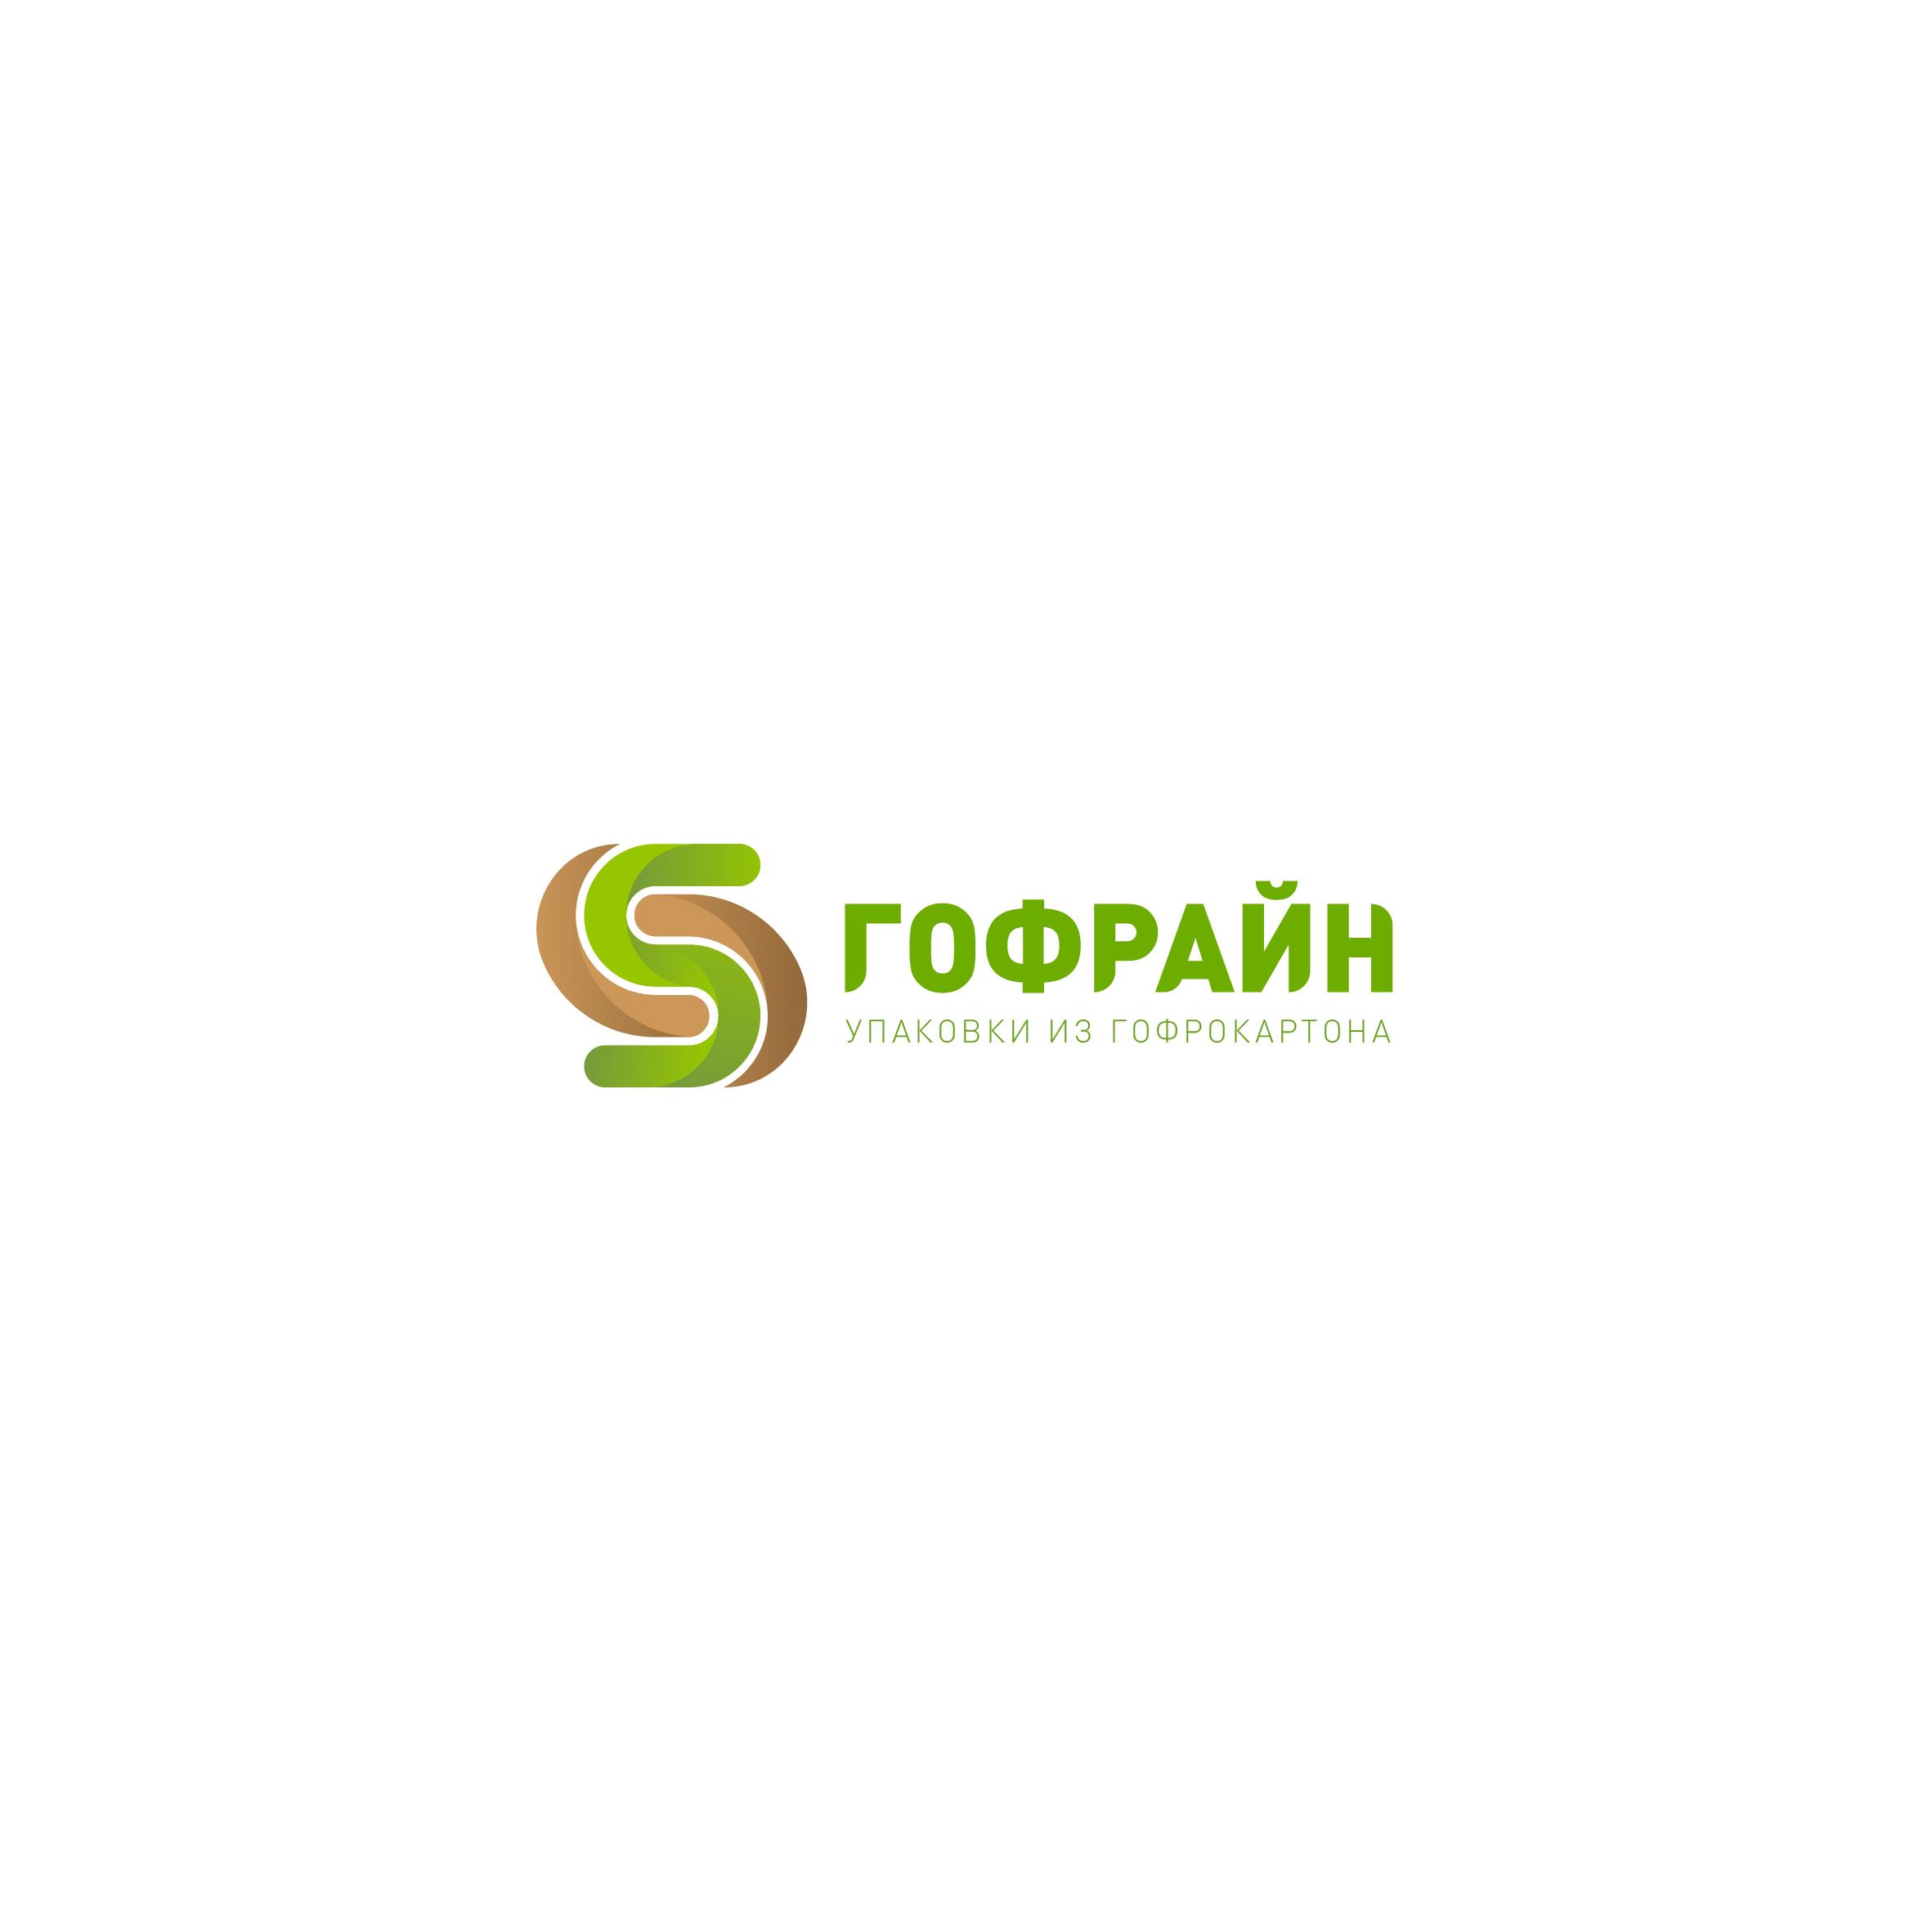 Логотип для компании по реализации упаковки из гофрокартона фото f_3635cdad8d312bf2.jpg